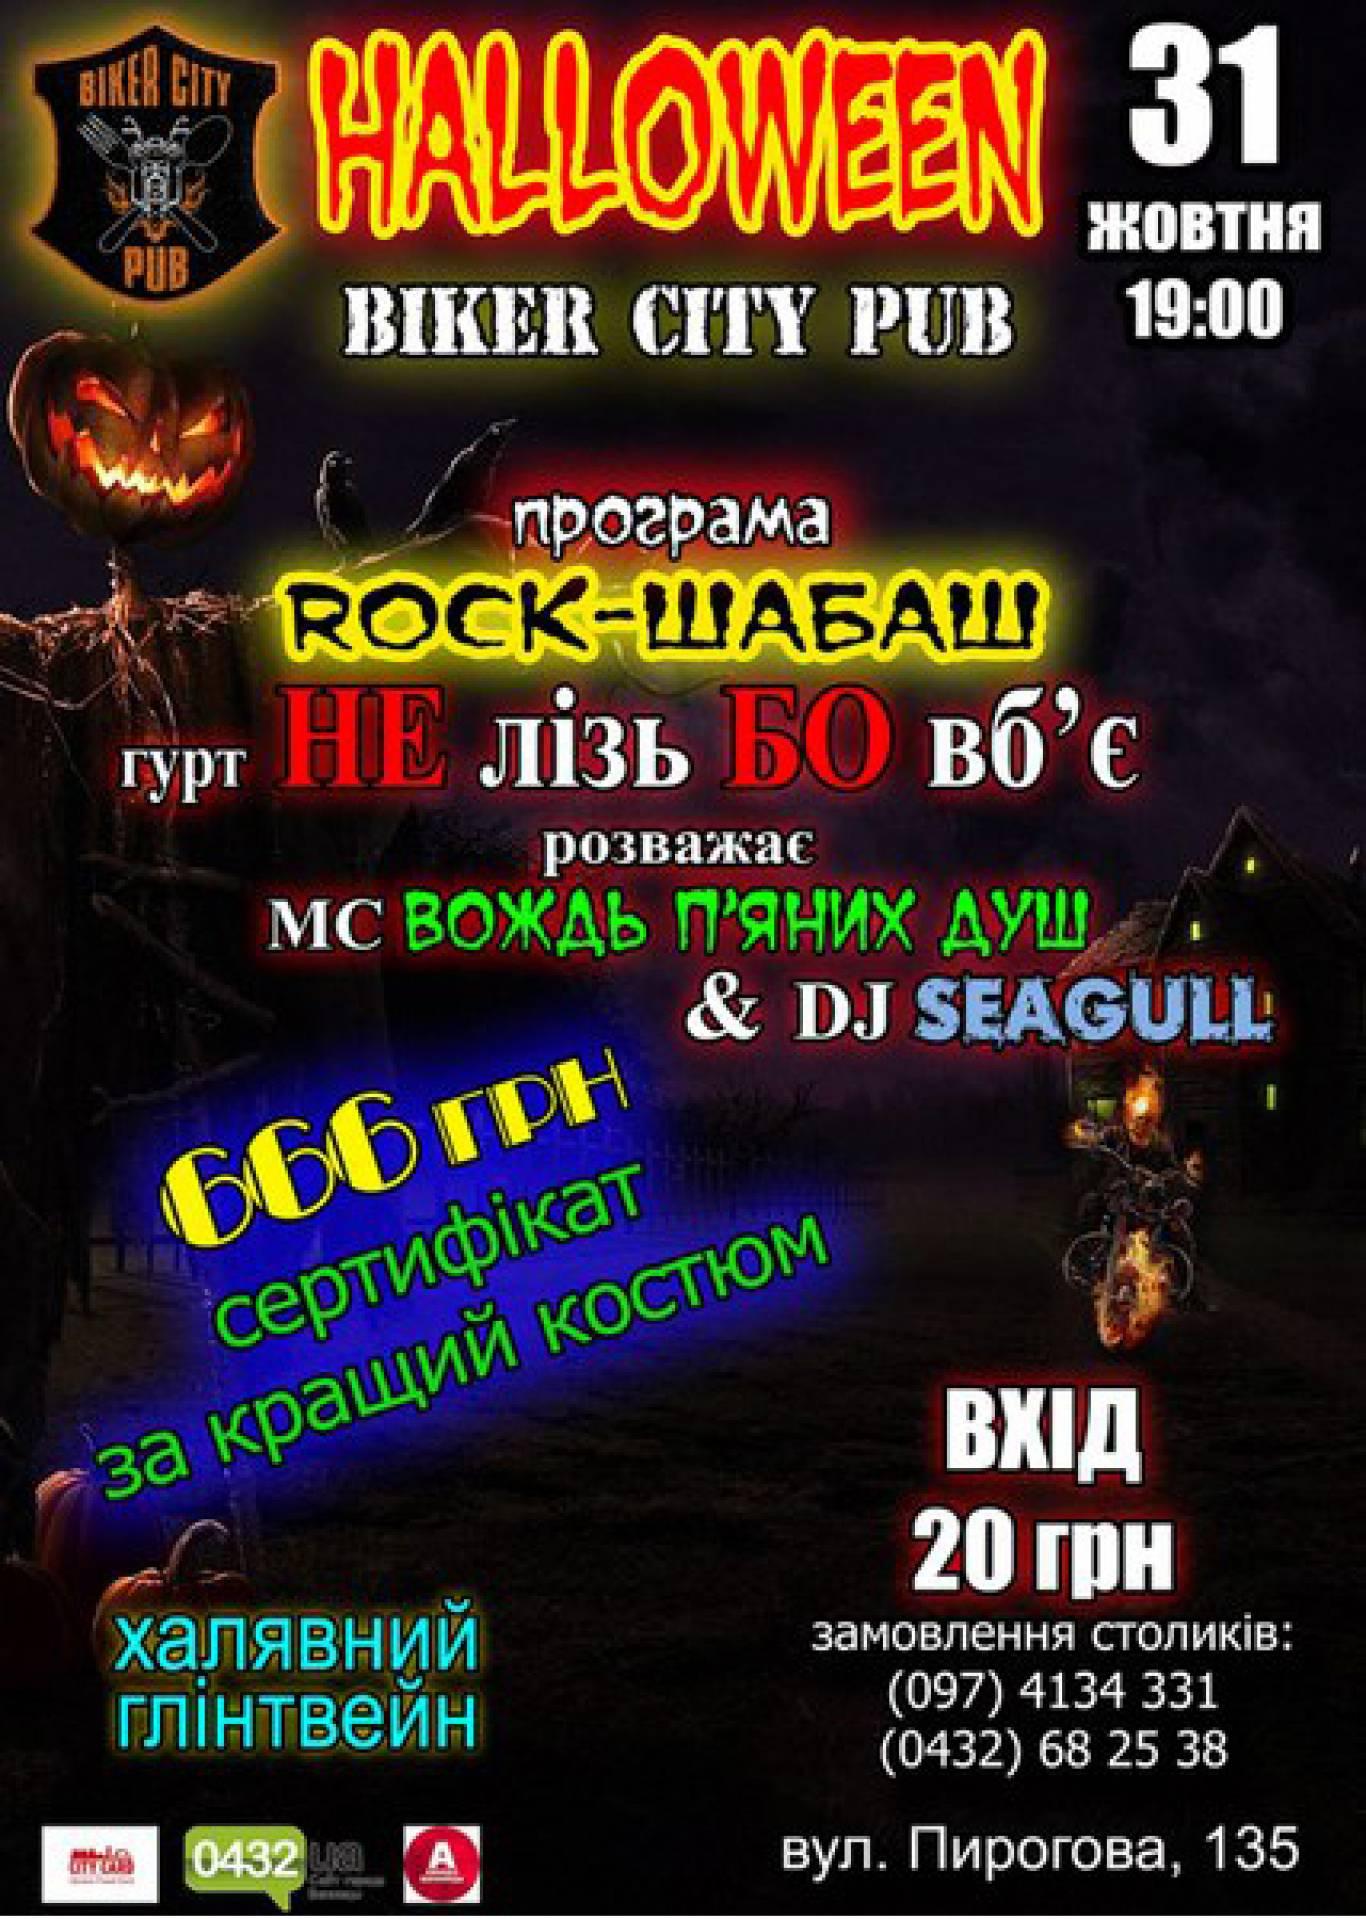 ROCK-шабаш у Biker City Pub